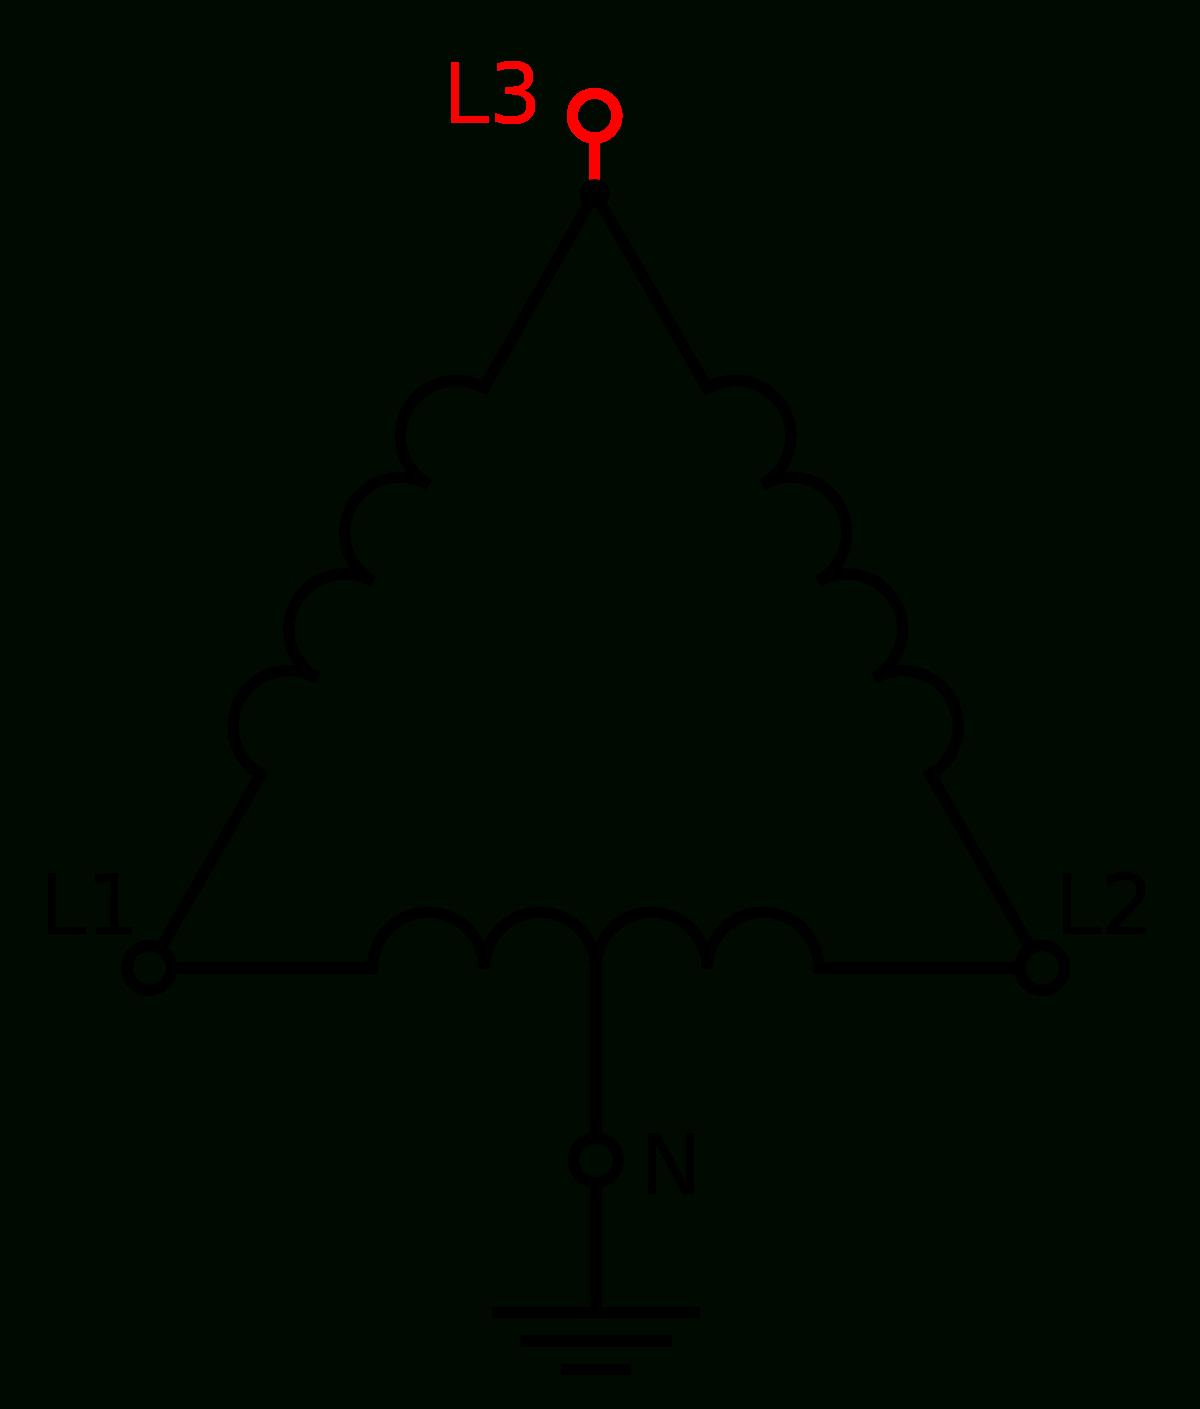 High-leg Delta - Wikipedia